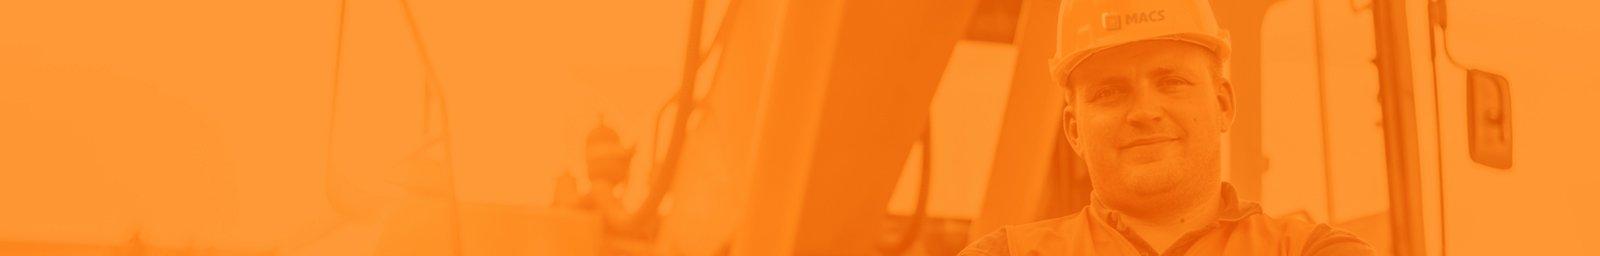 orange hero